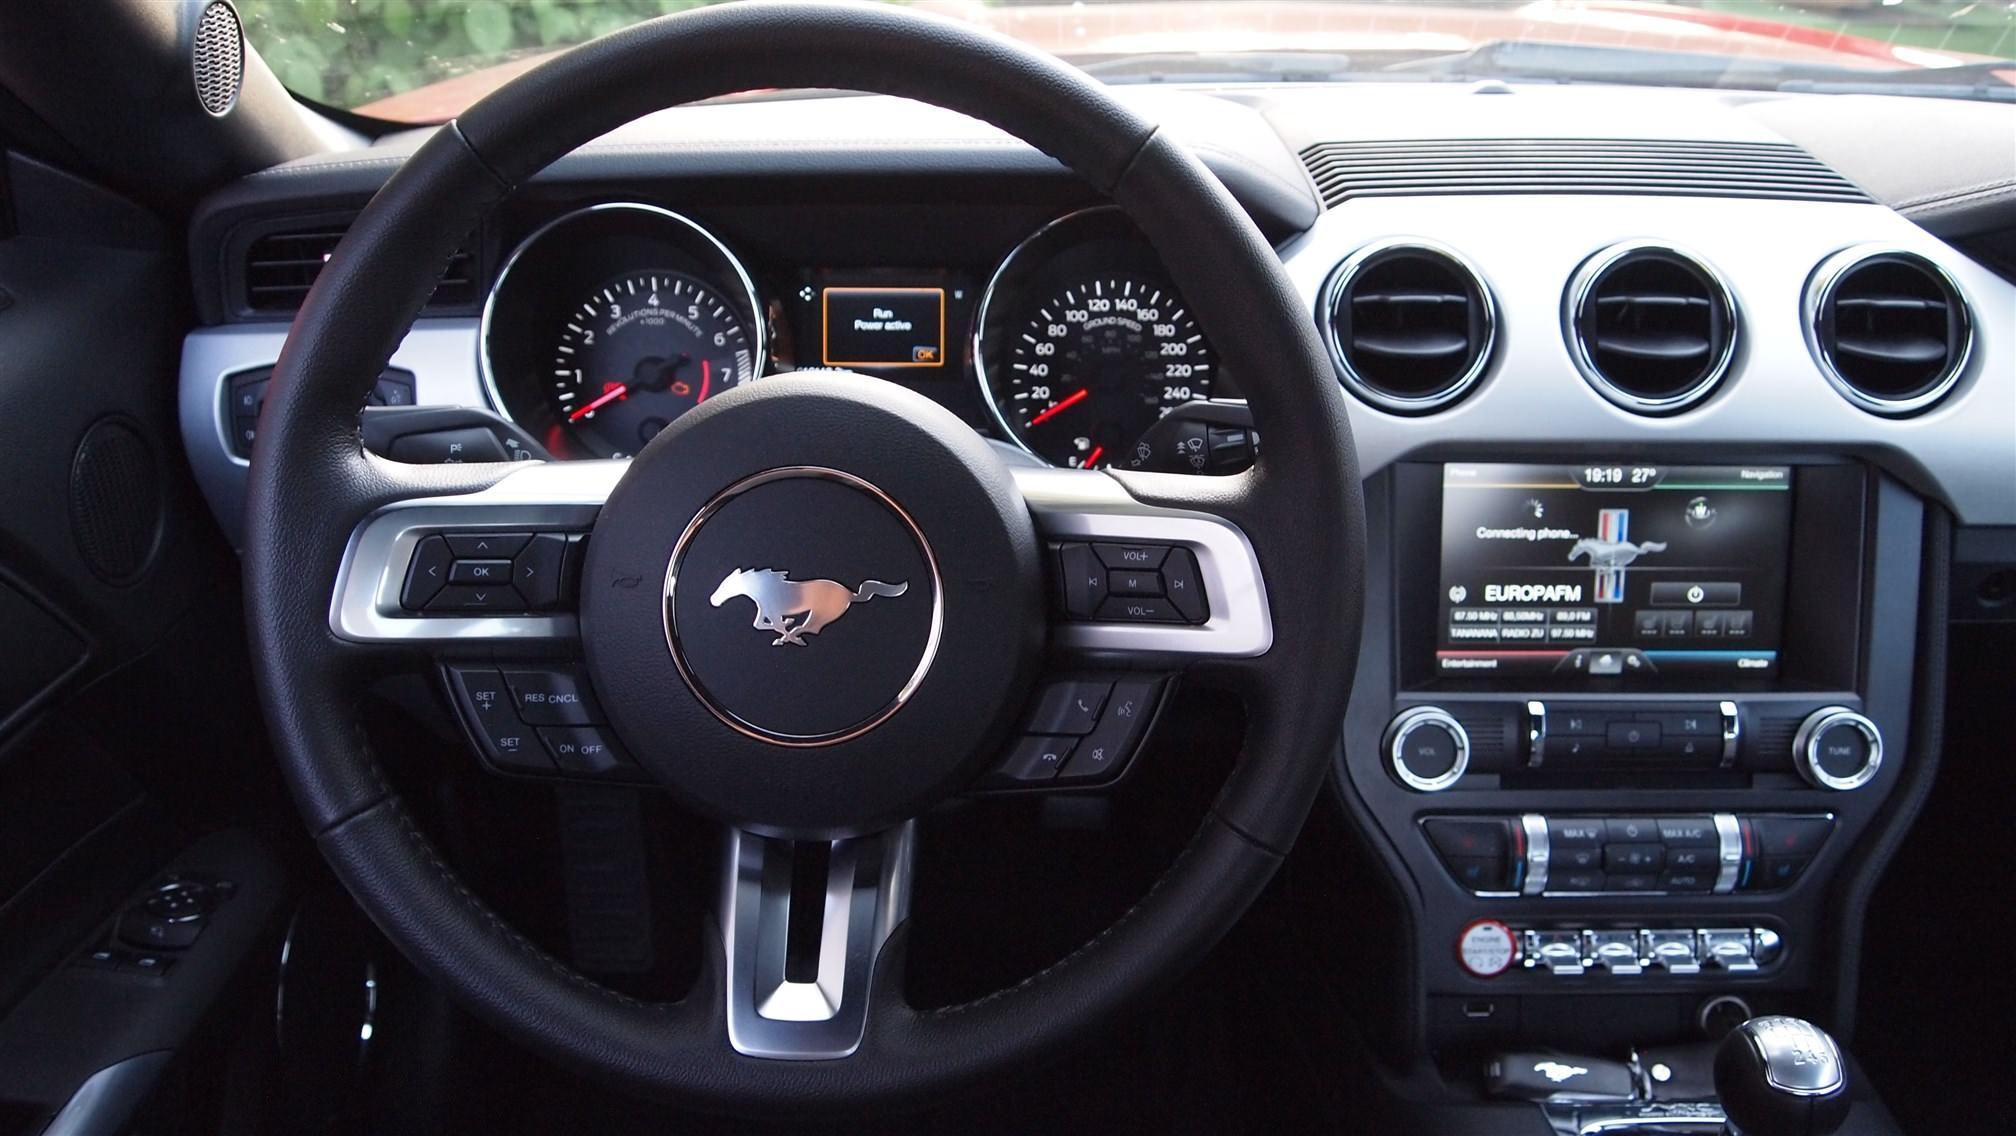 Ford Mustang Interior (9)